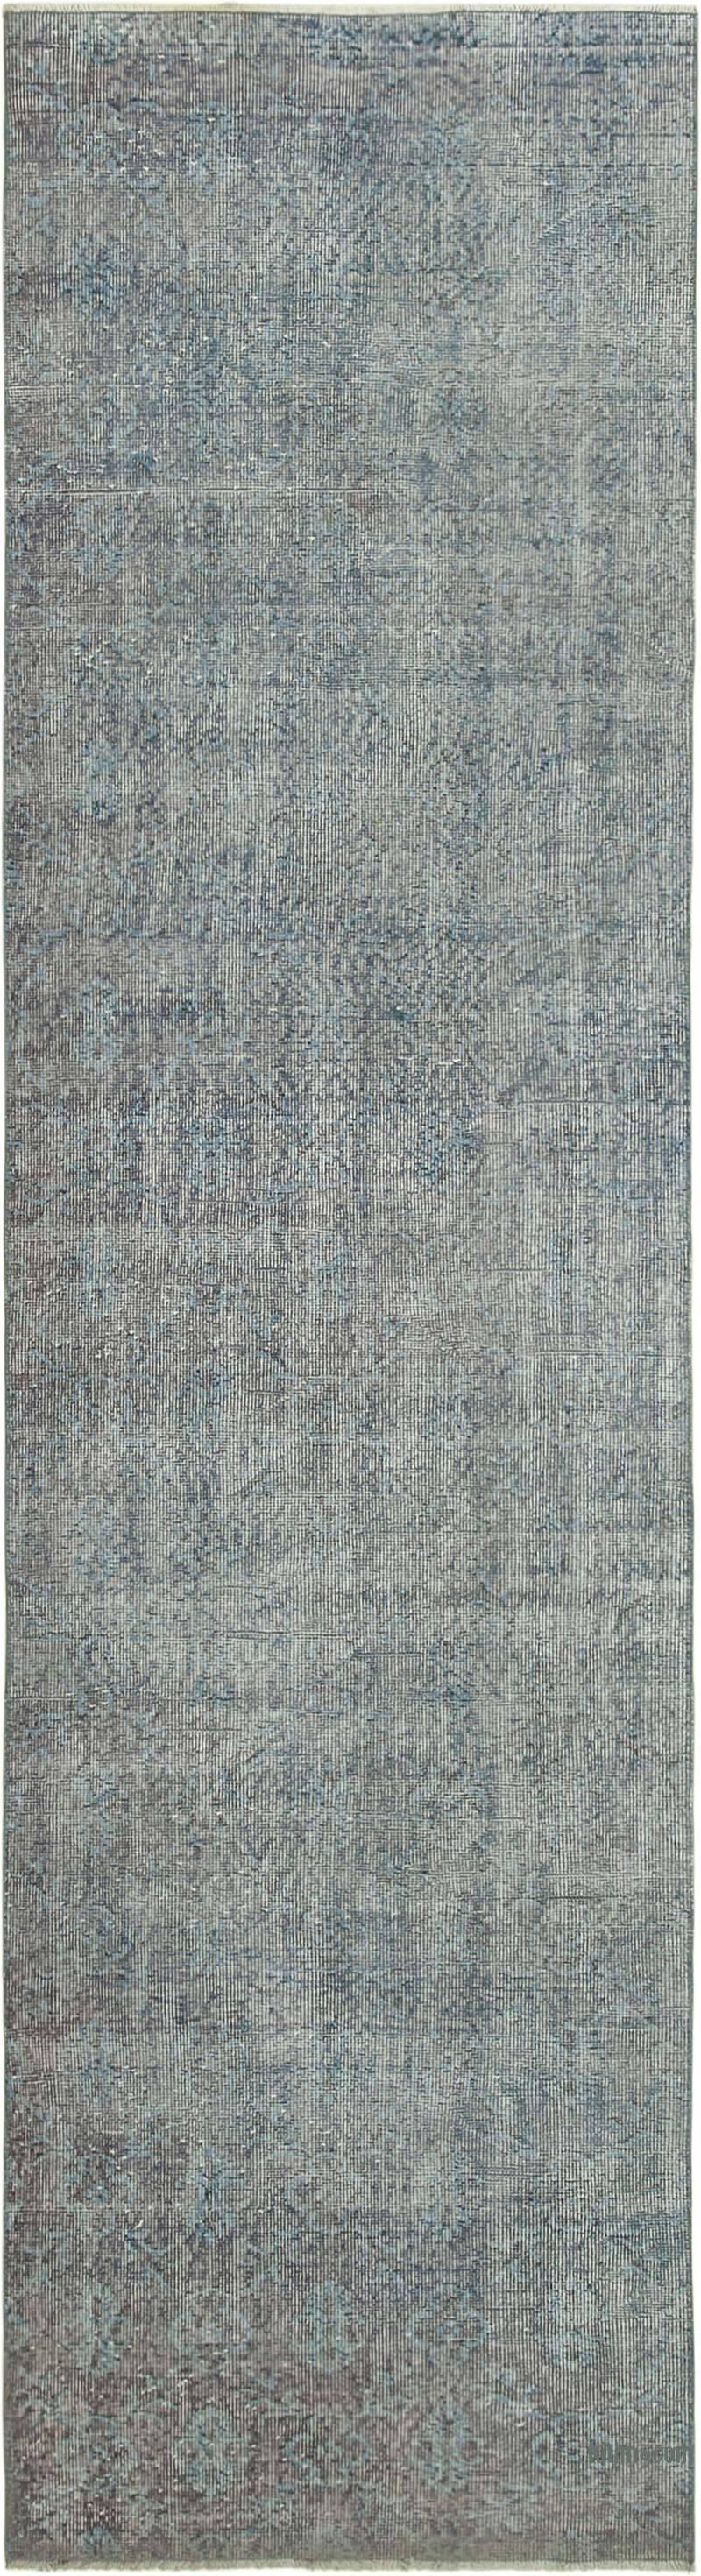 Blue Over-dyed Turkish Vintage Runner Rug - 3'  x 11'  (36 in. x 132 in.) - K0052164